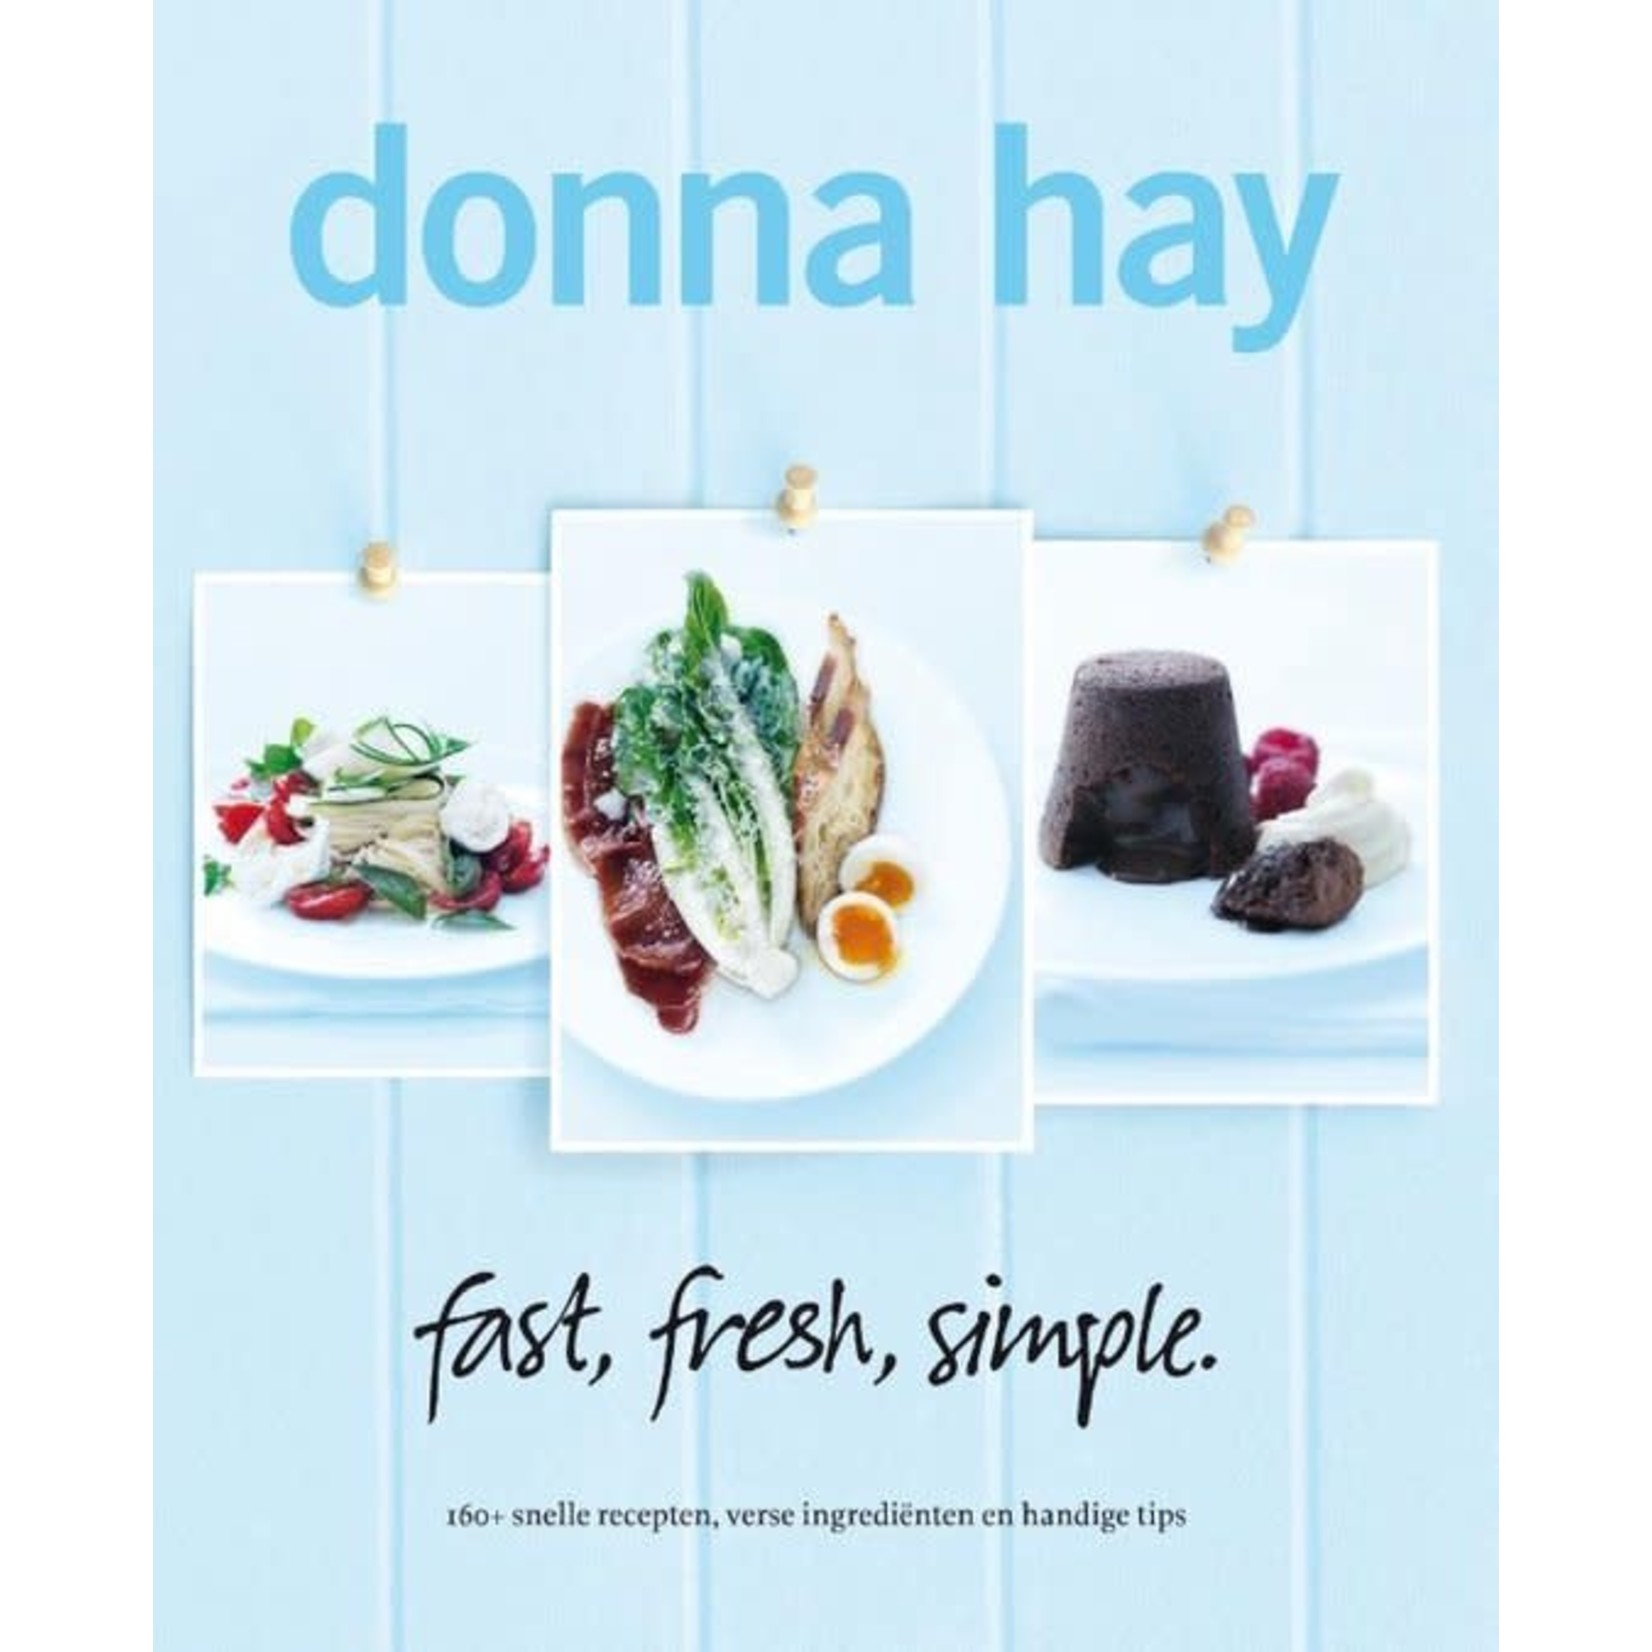 Donna Hay - Fast, fresh, simple